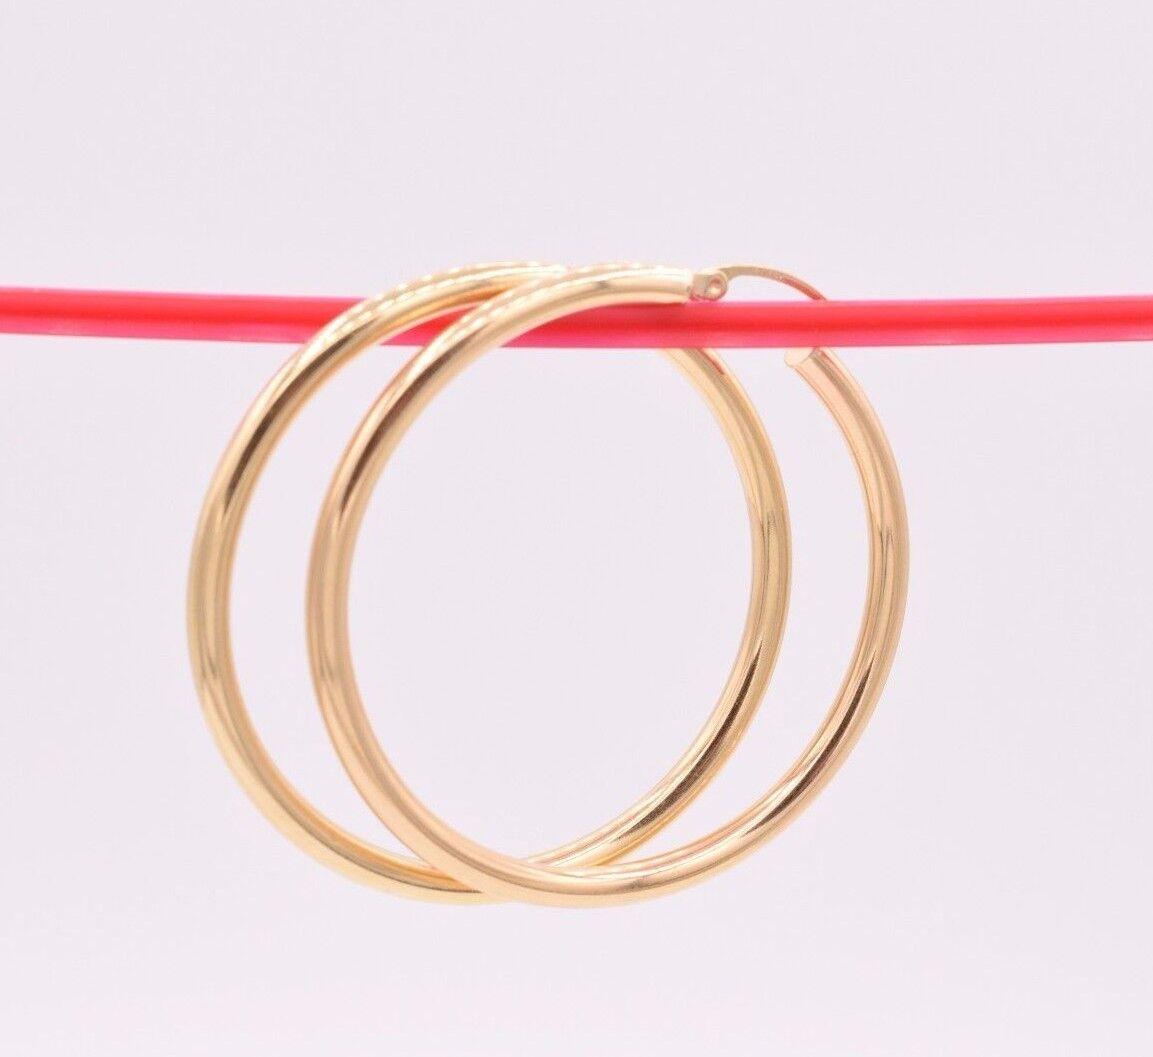 3mm X 30mm Plain Shiny Hoop Earrings REAL 14K Yellow Gold FREE SHIPPING